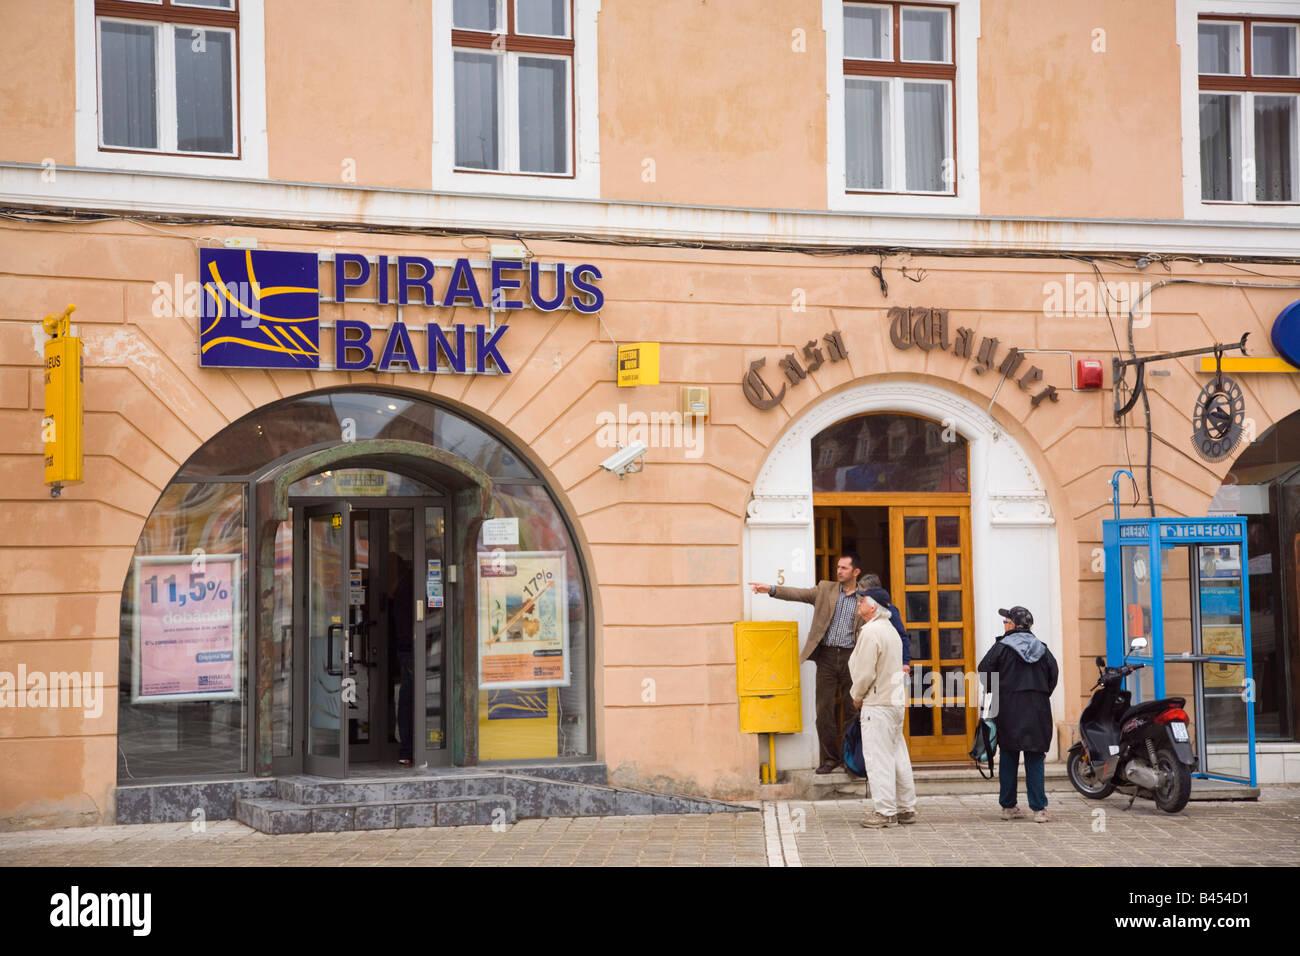 Brasov Transylvania Romania Europe Piraeus Bank retail banking branch building exterior in historic city - Stock Image